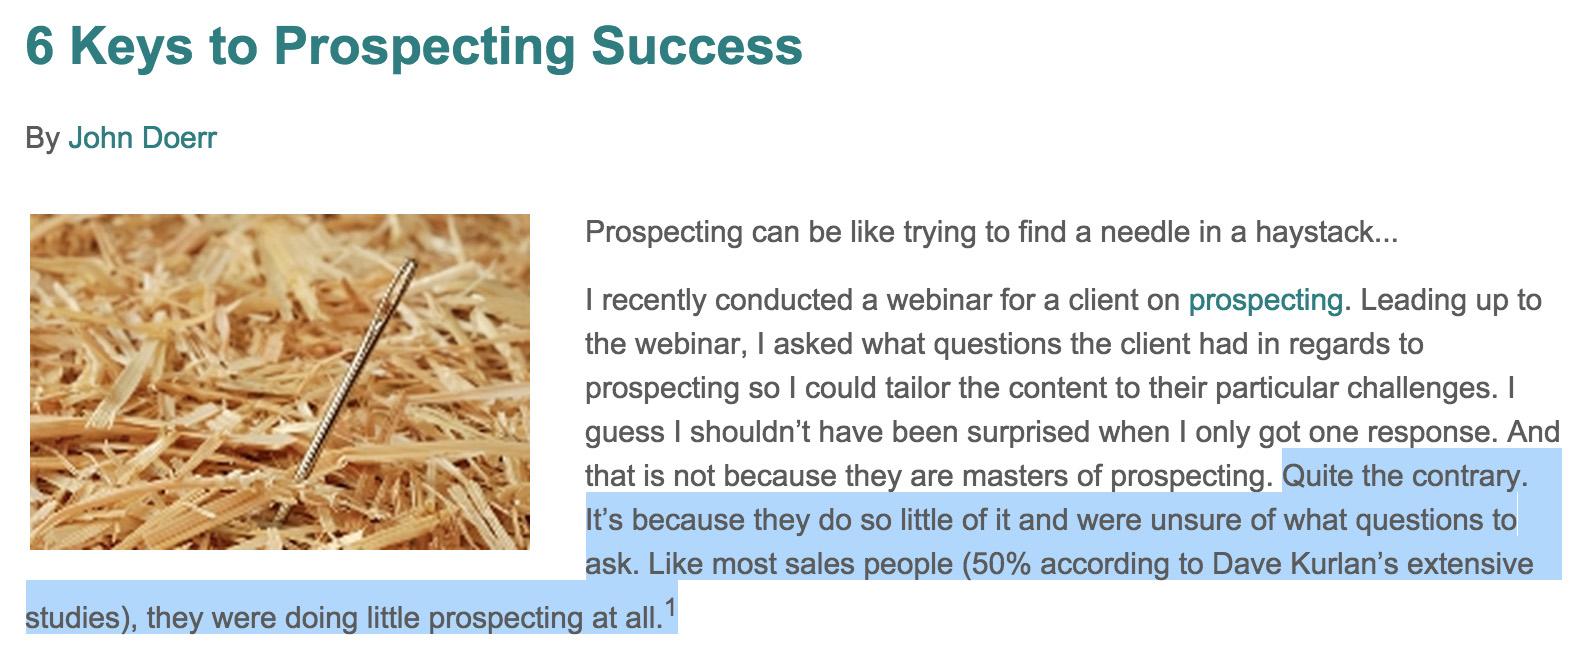 Importance of Prospecting